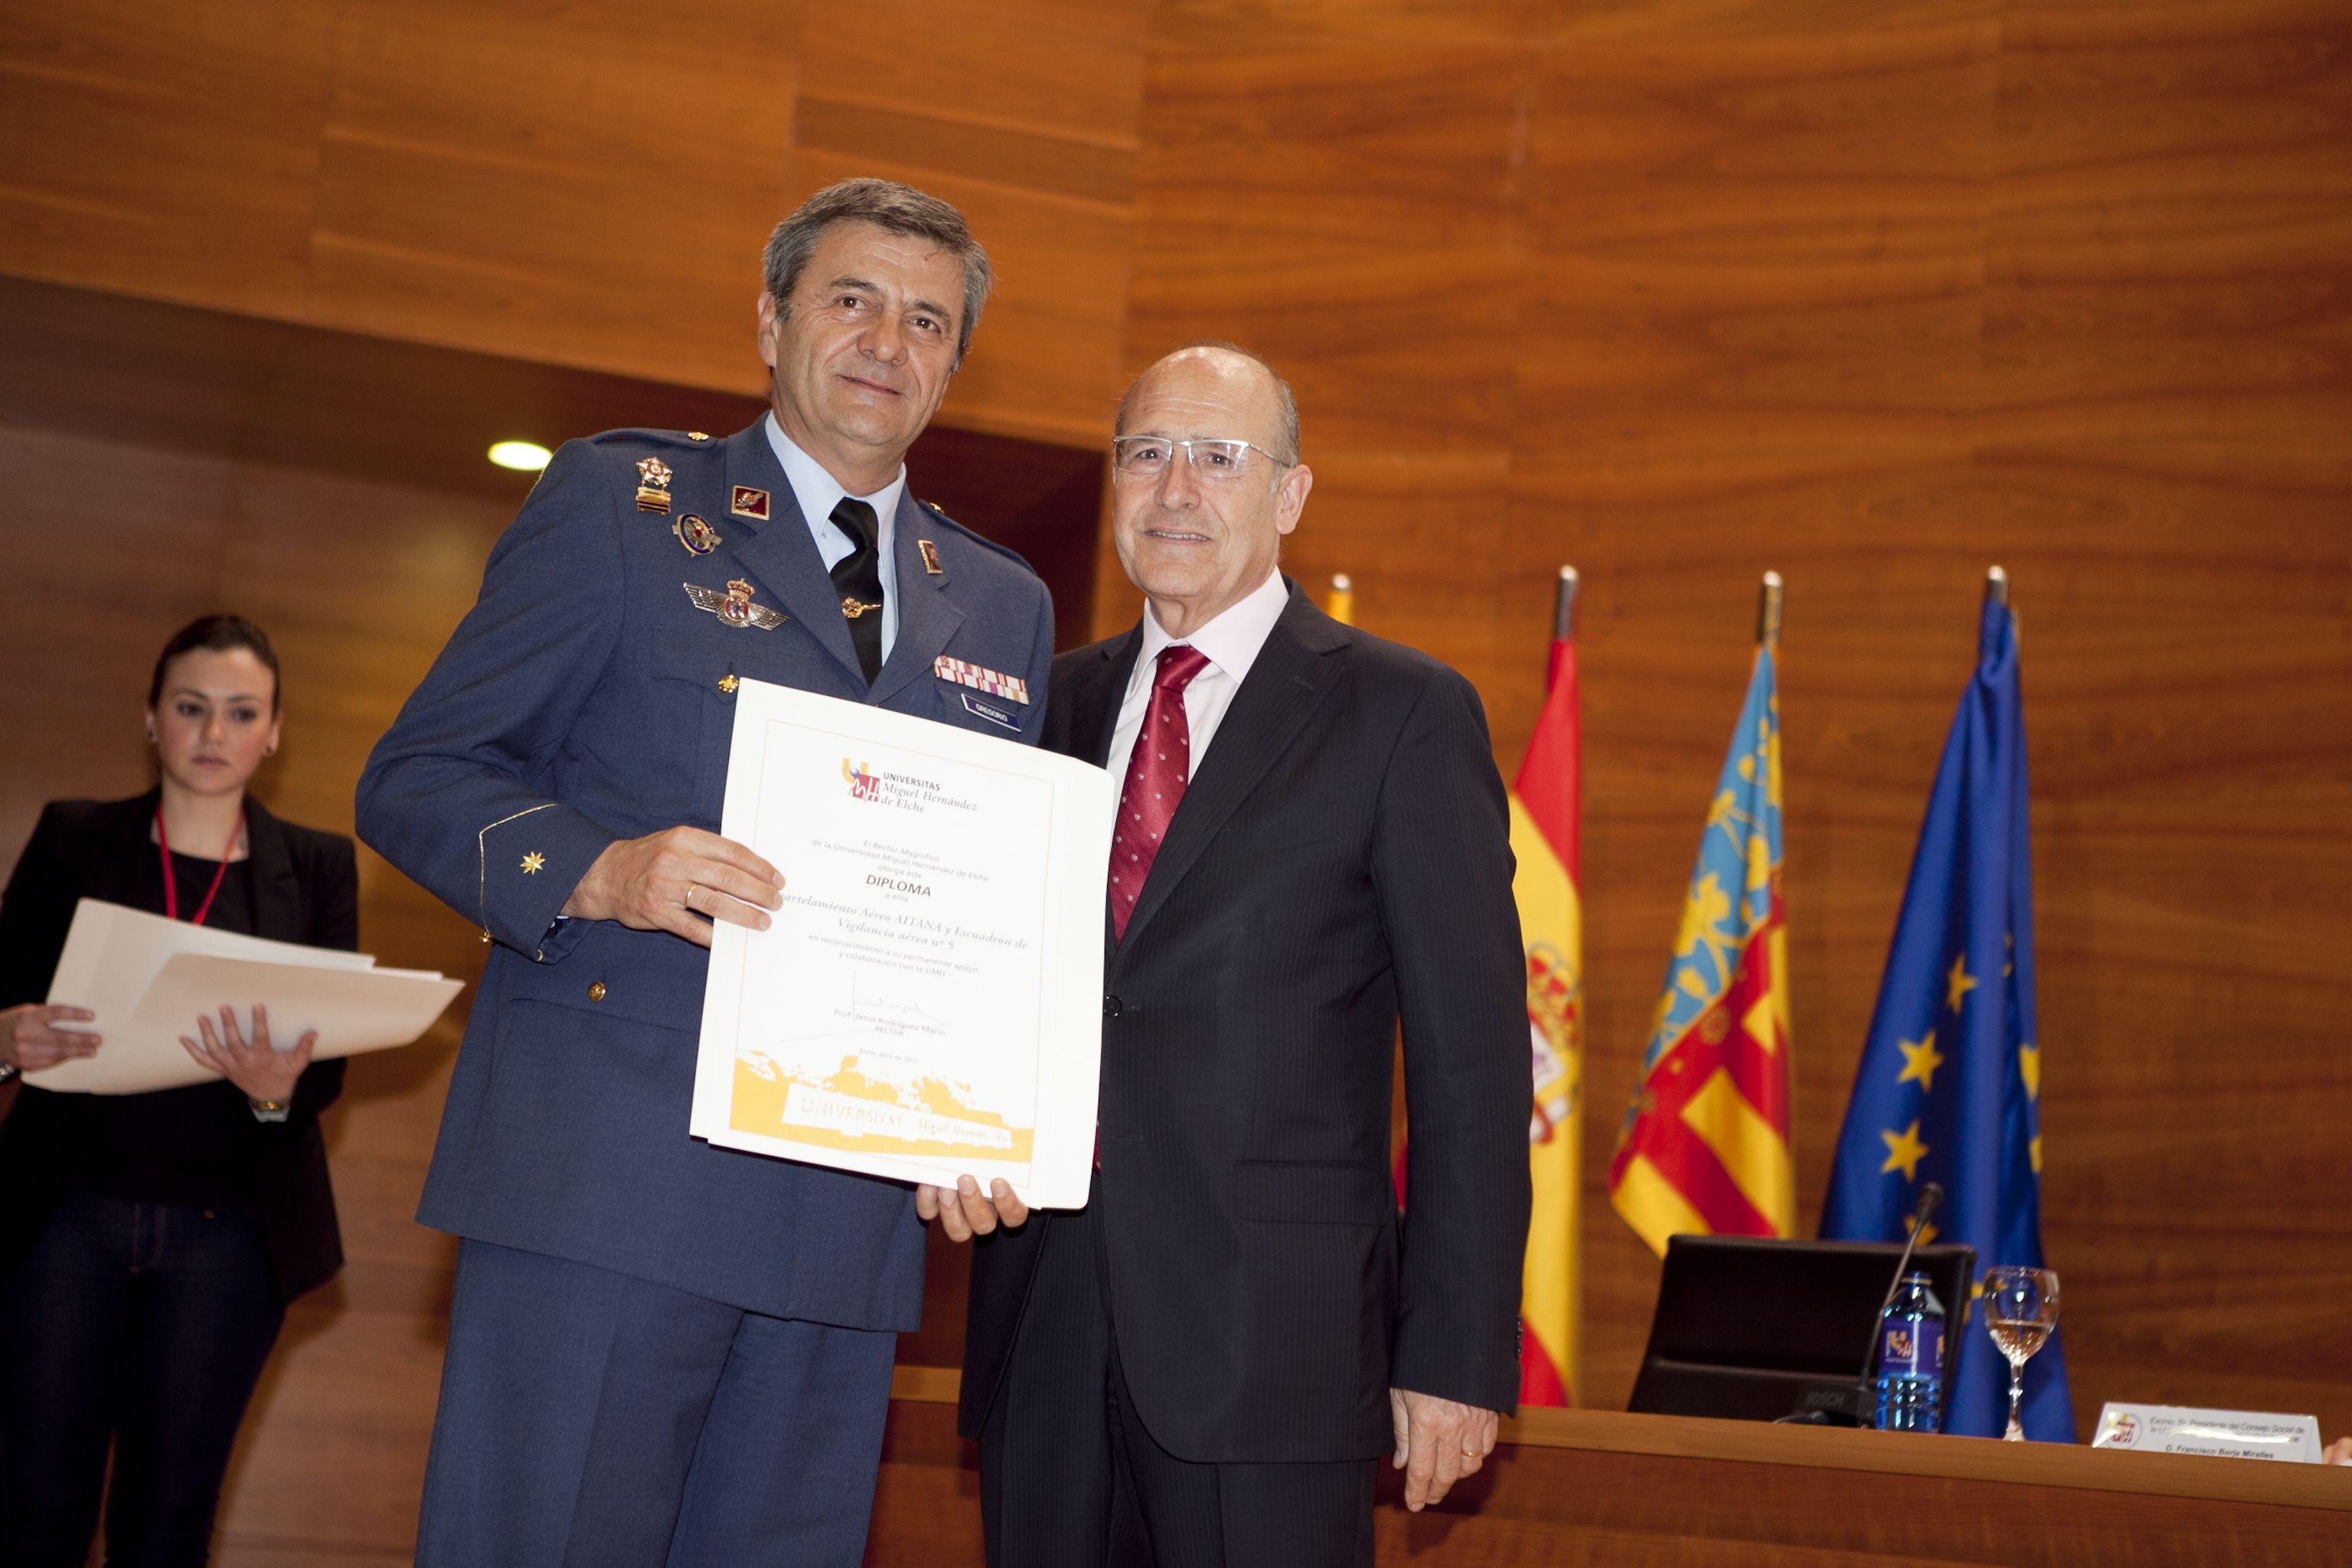 umh-diplomas-rector_mg_7009.jpg